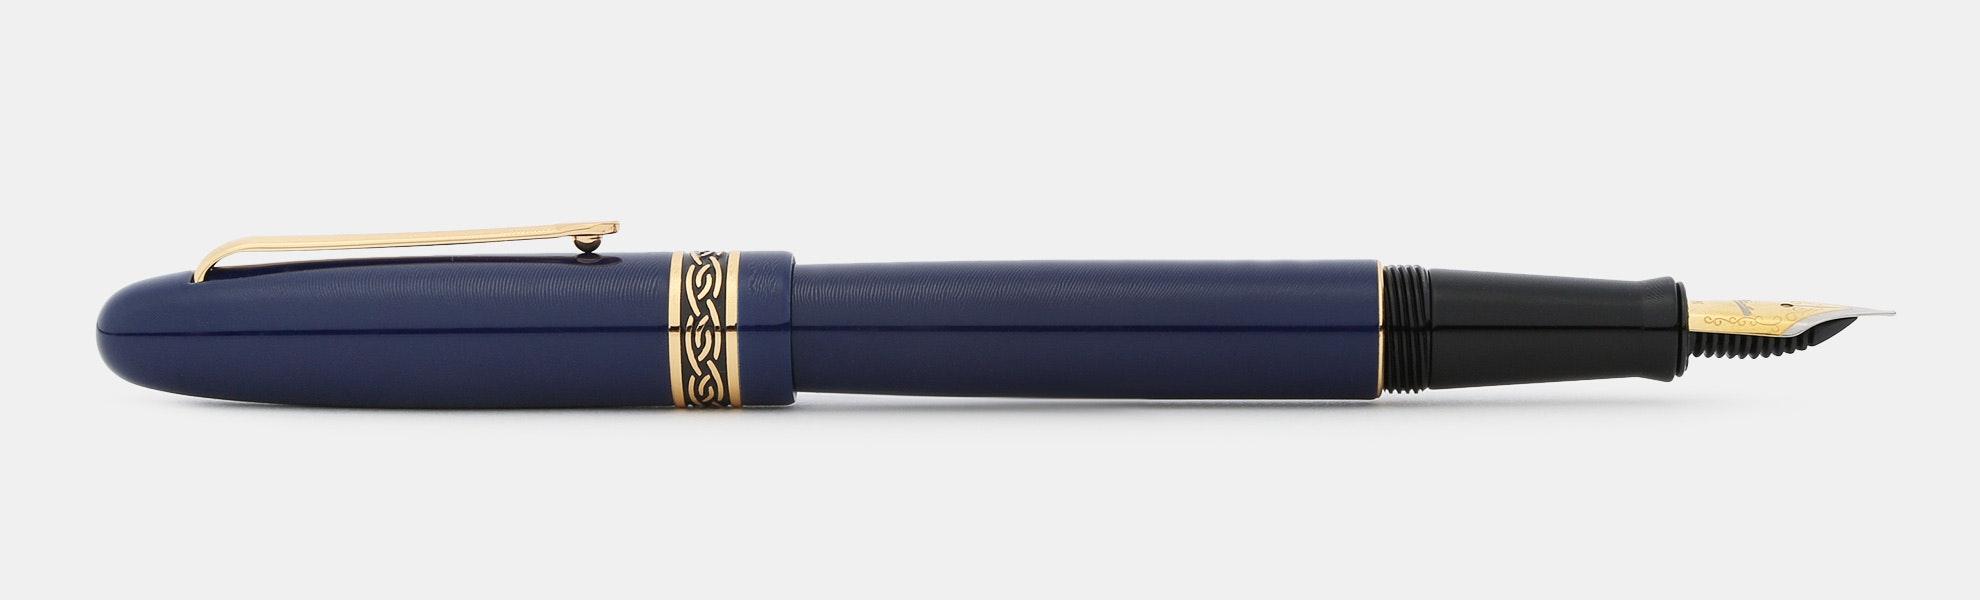 Italix Parson's Essential Fountain Pen